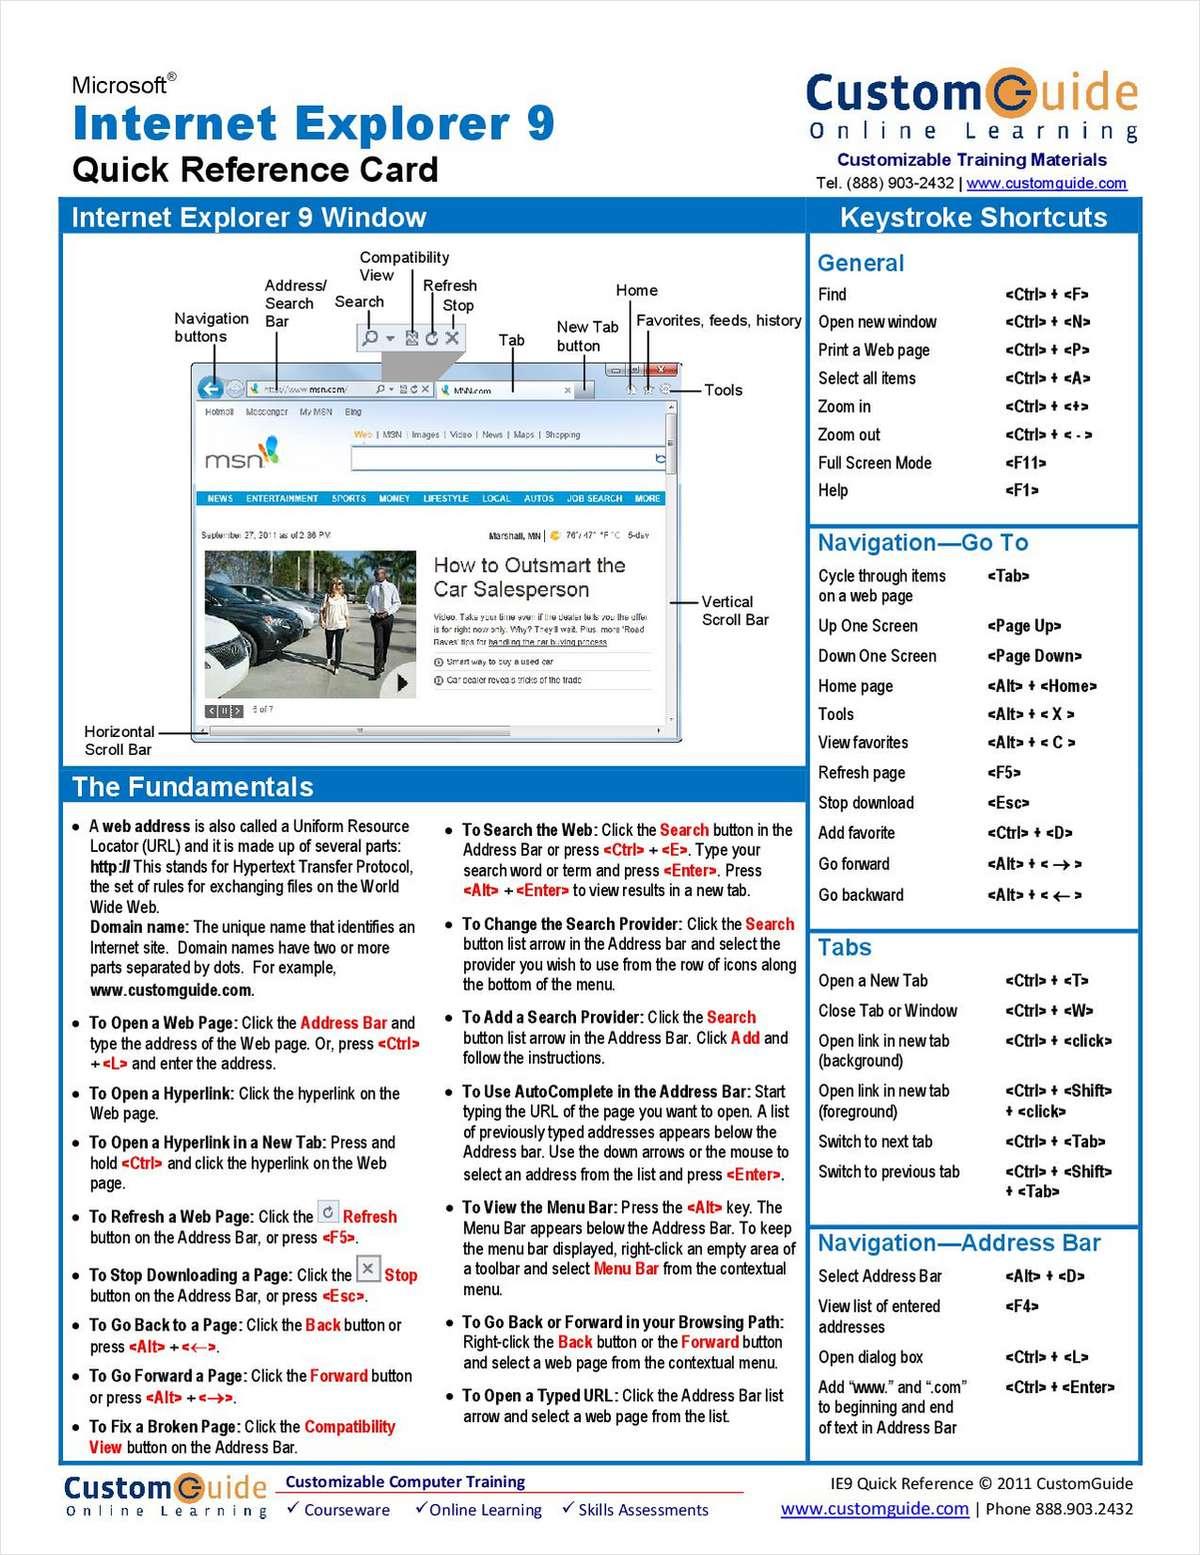 Microsoft Internet Explorer 9 - Free Quick Reference Card